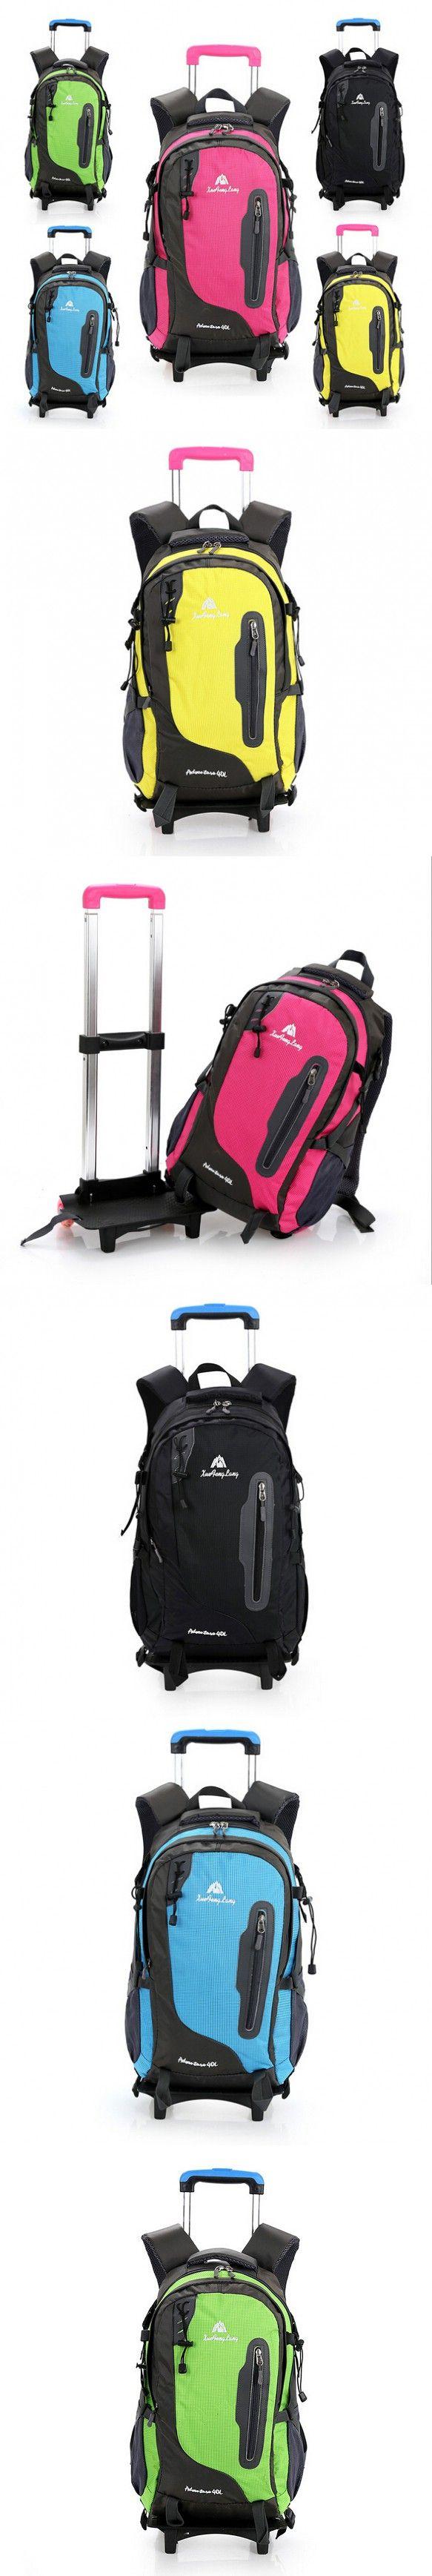 School bags fashion orthopedic backpack kids school bag with wheels casual men and women bag trolley bag detachable &80027